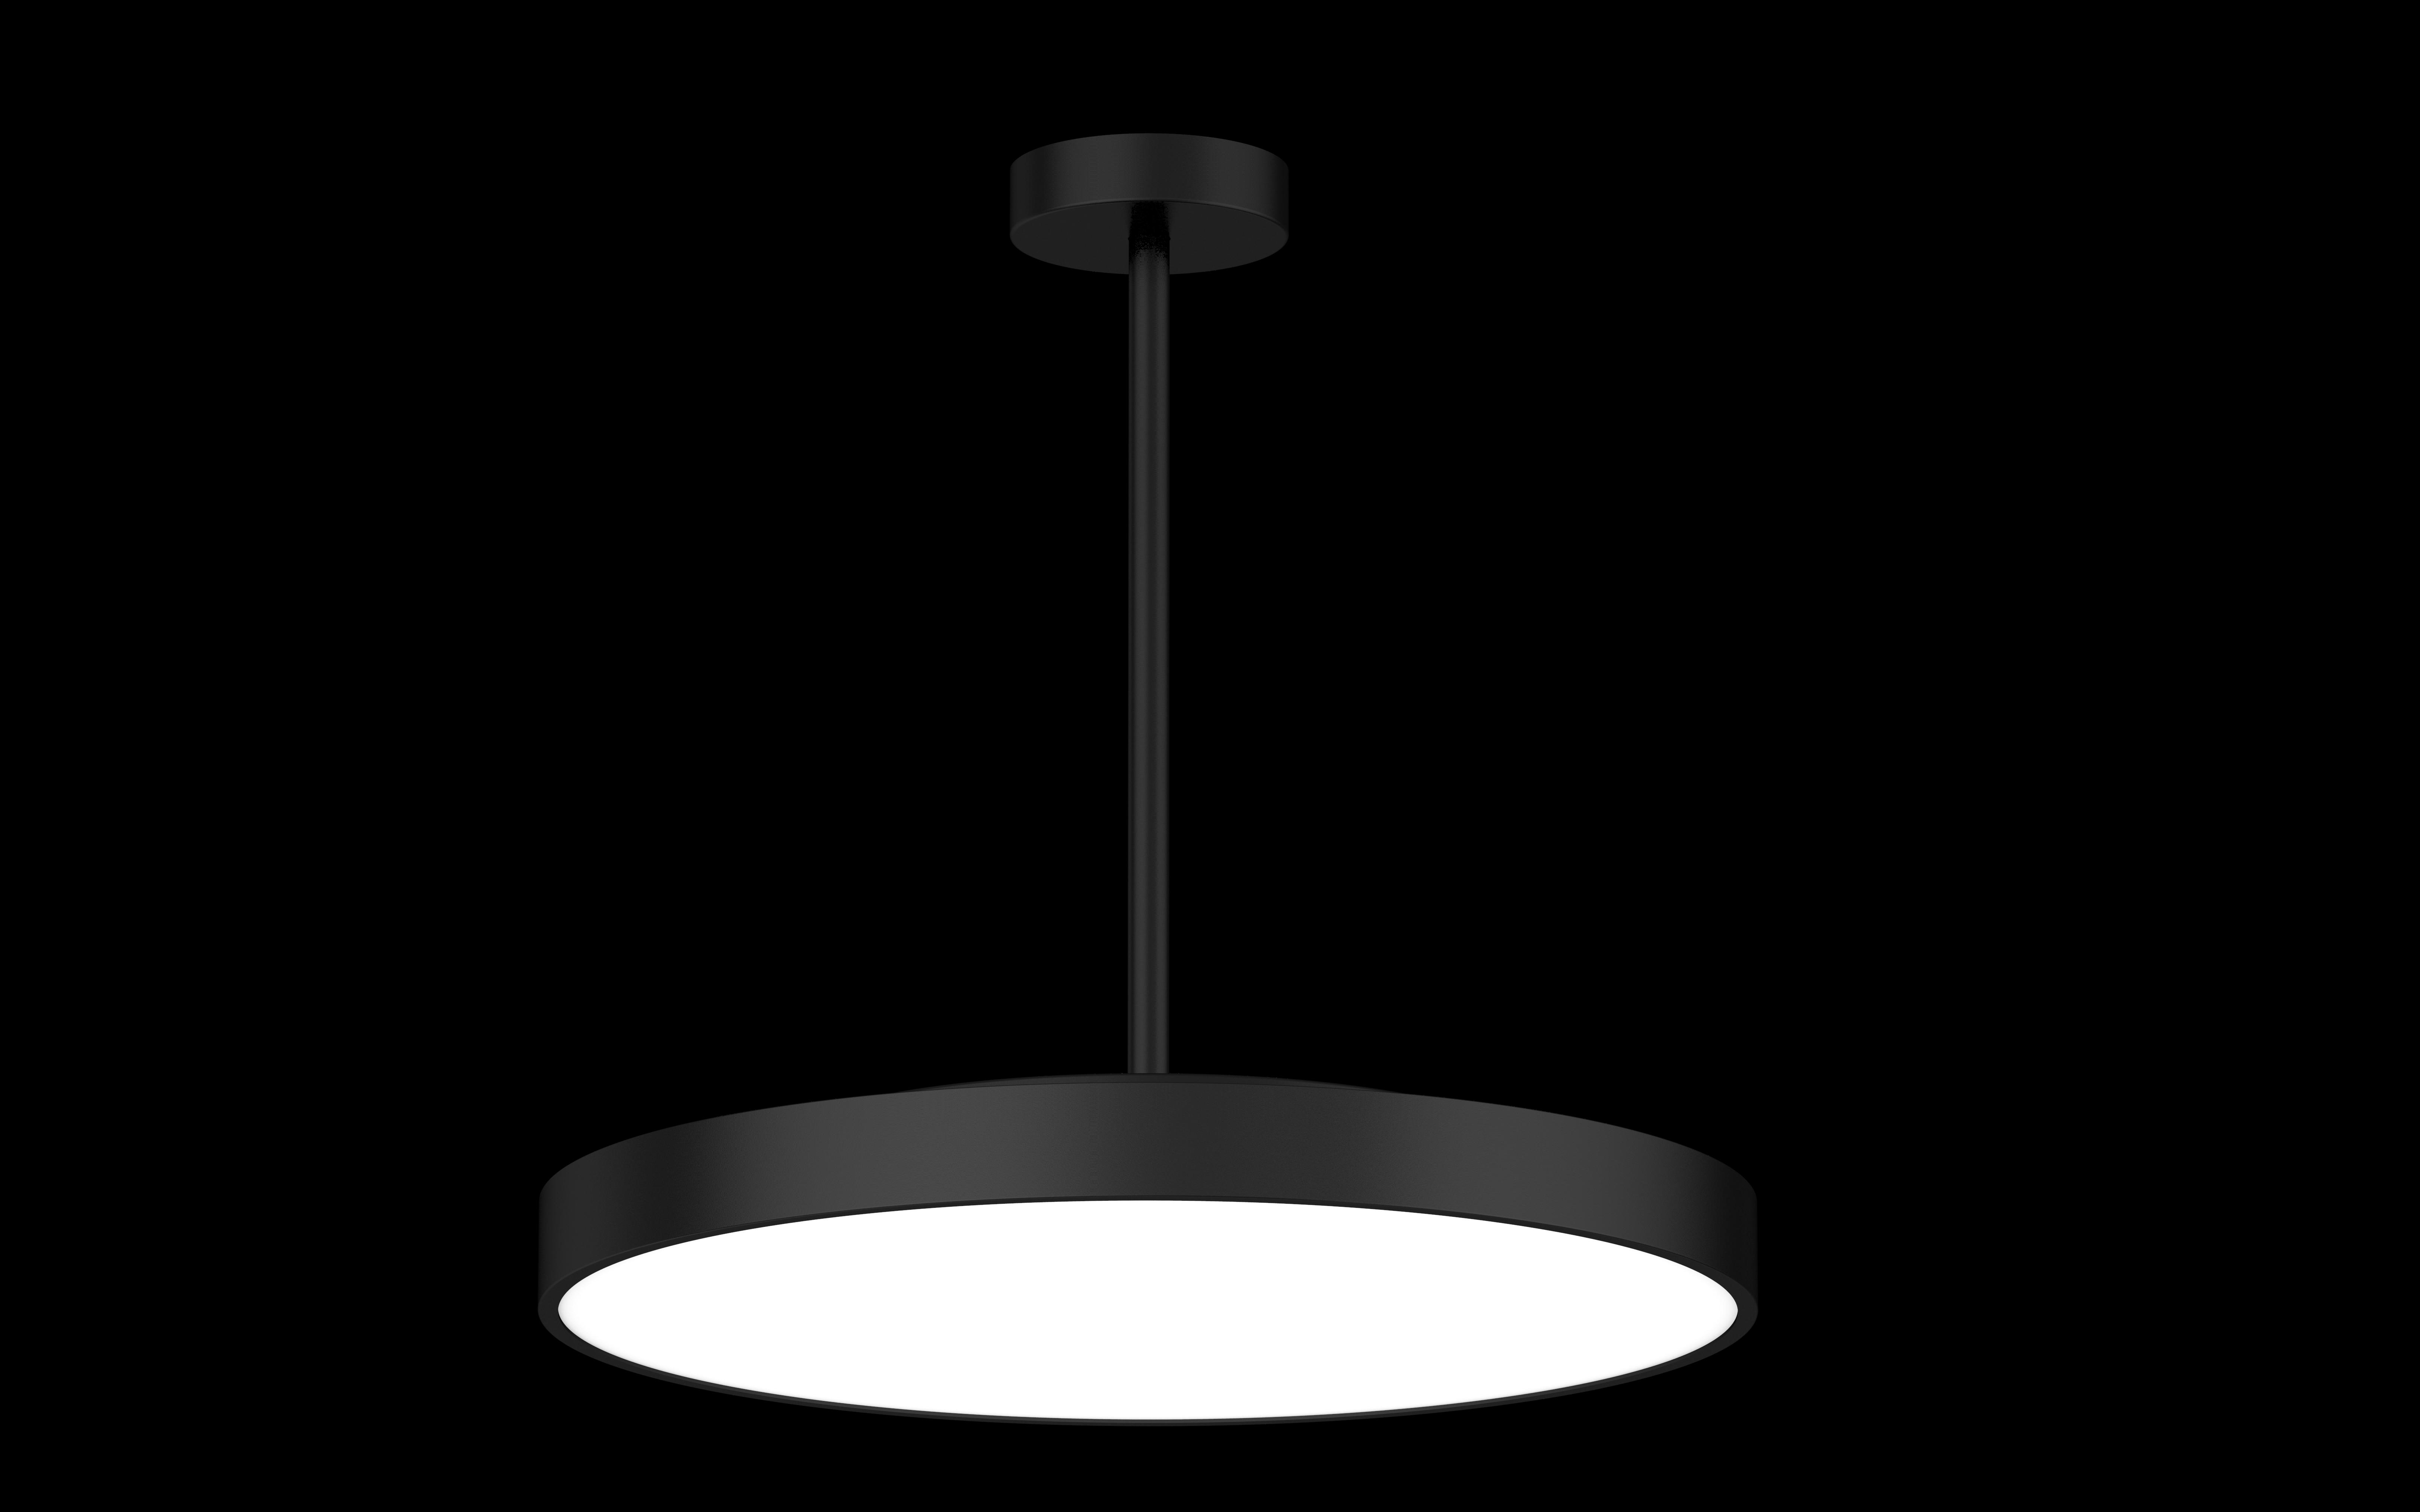 LED Hängeleuchte Rohrabhängung Roma flat